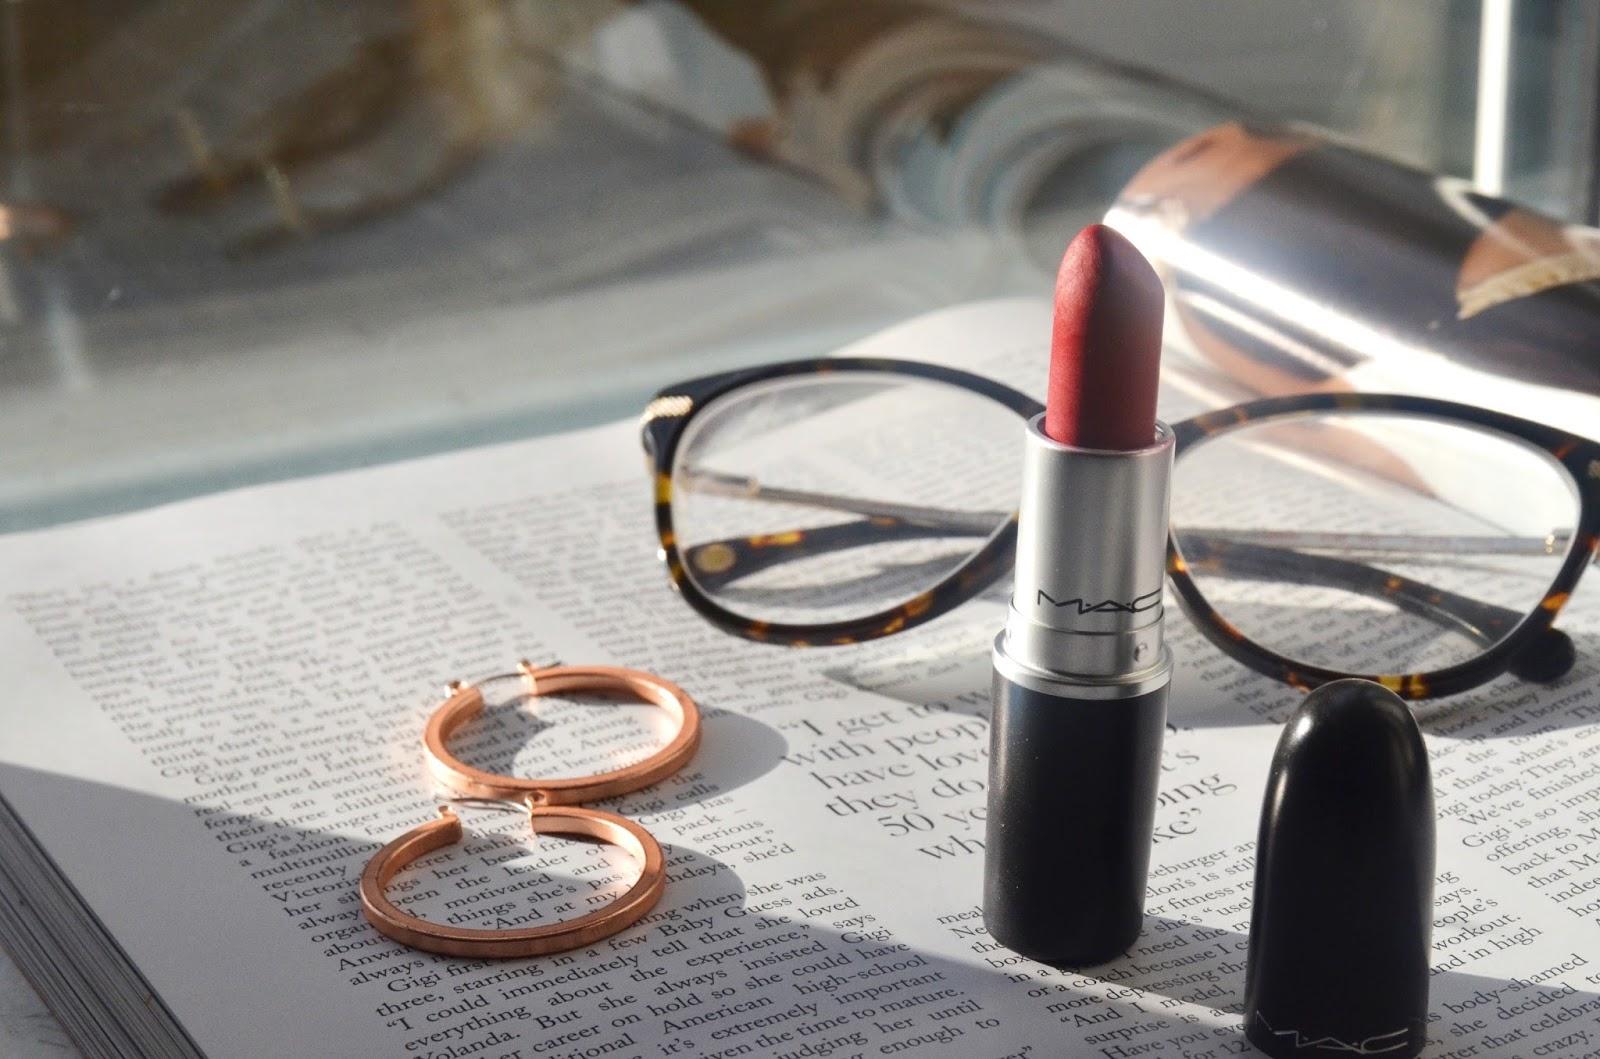 rihanna red lipstick ruby woo